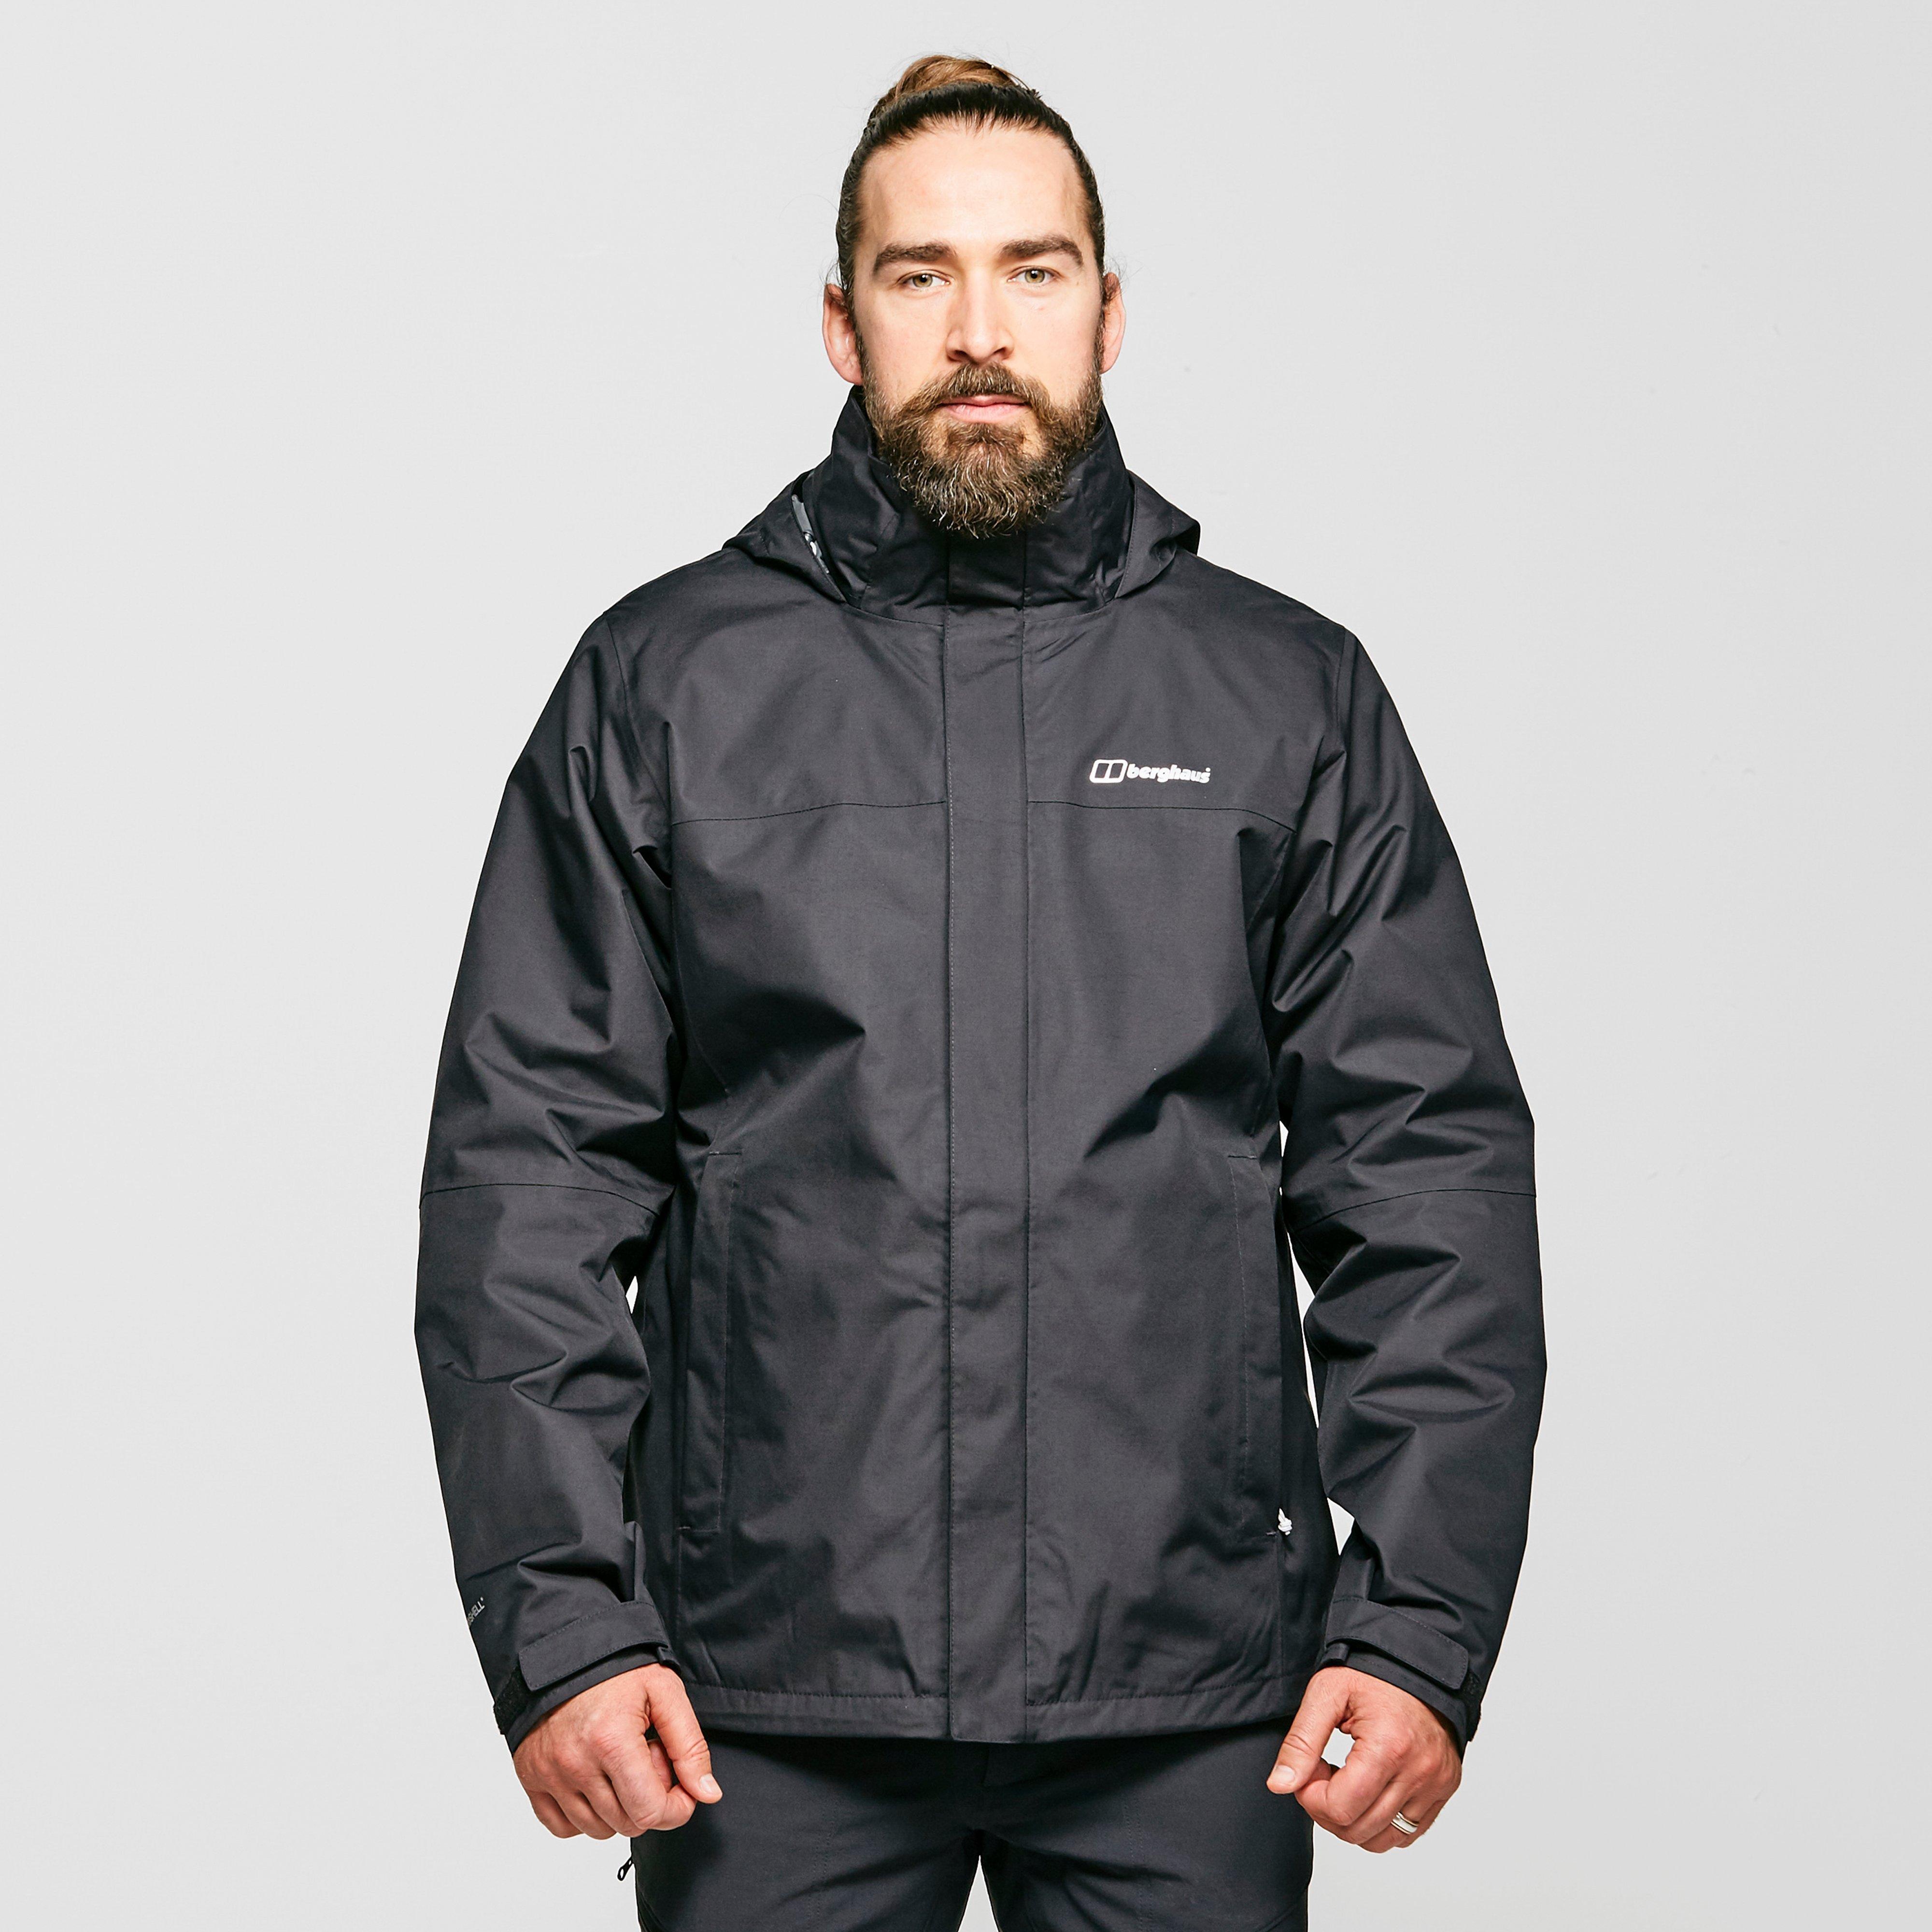 Berghaus Mens Alpha Ii 3-in-1 Jacket - Black/blk  Black/blk